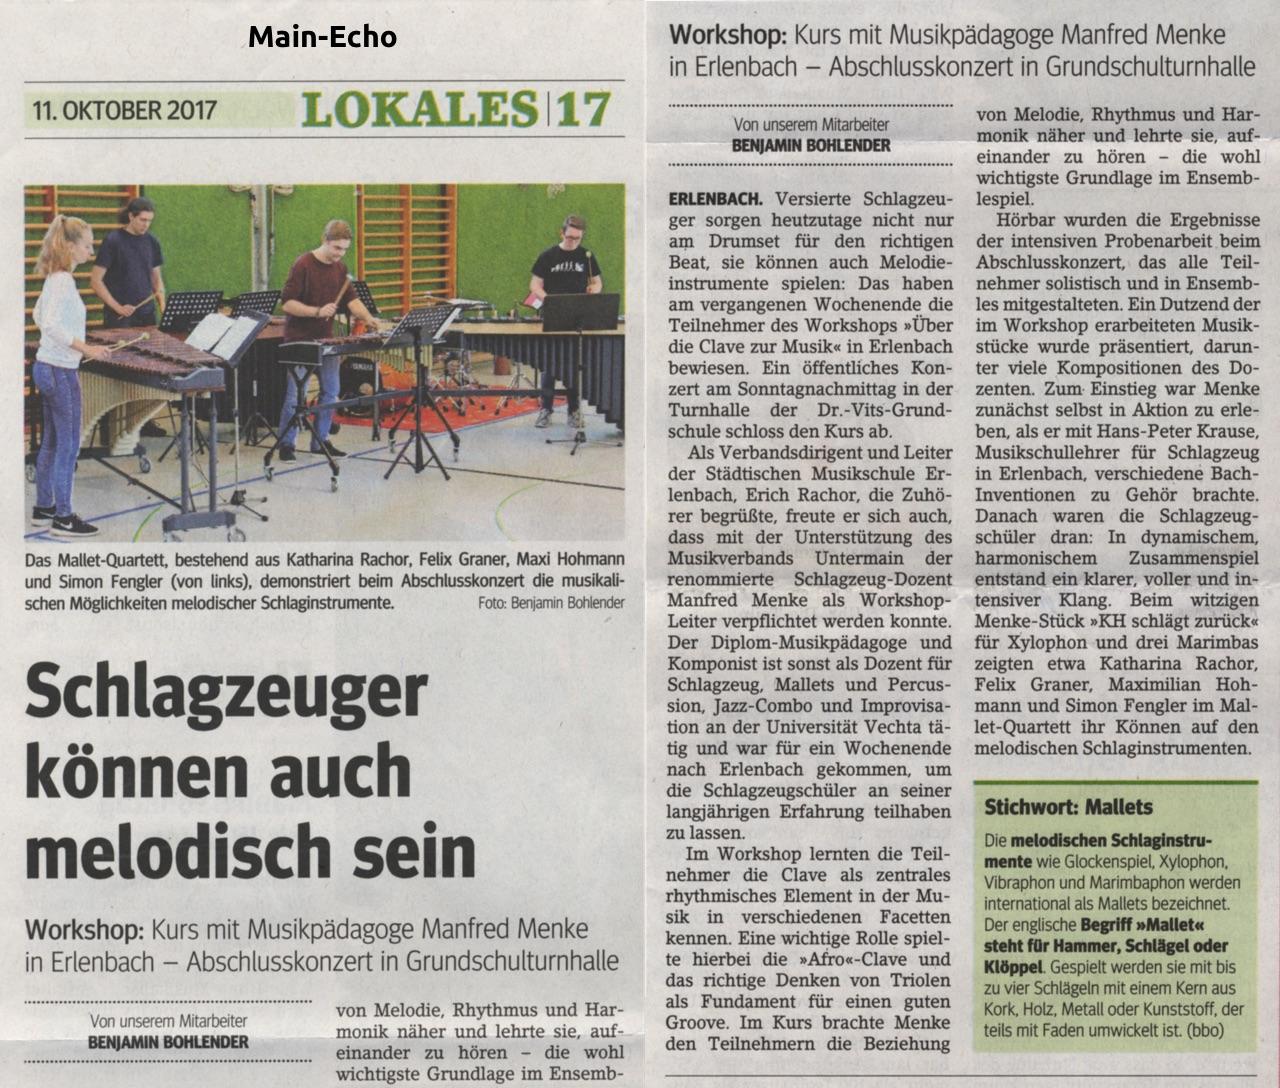 Zeitungsartikel · Main Echo, 11. Oktober 2017